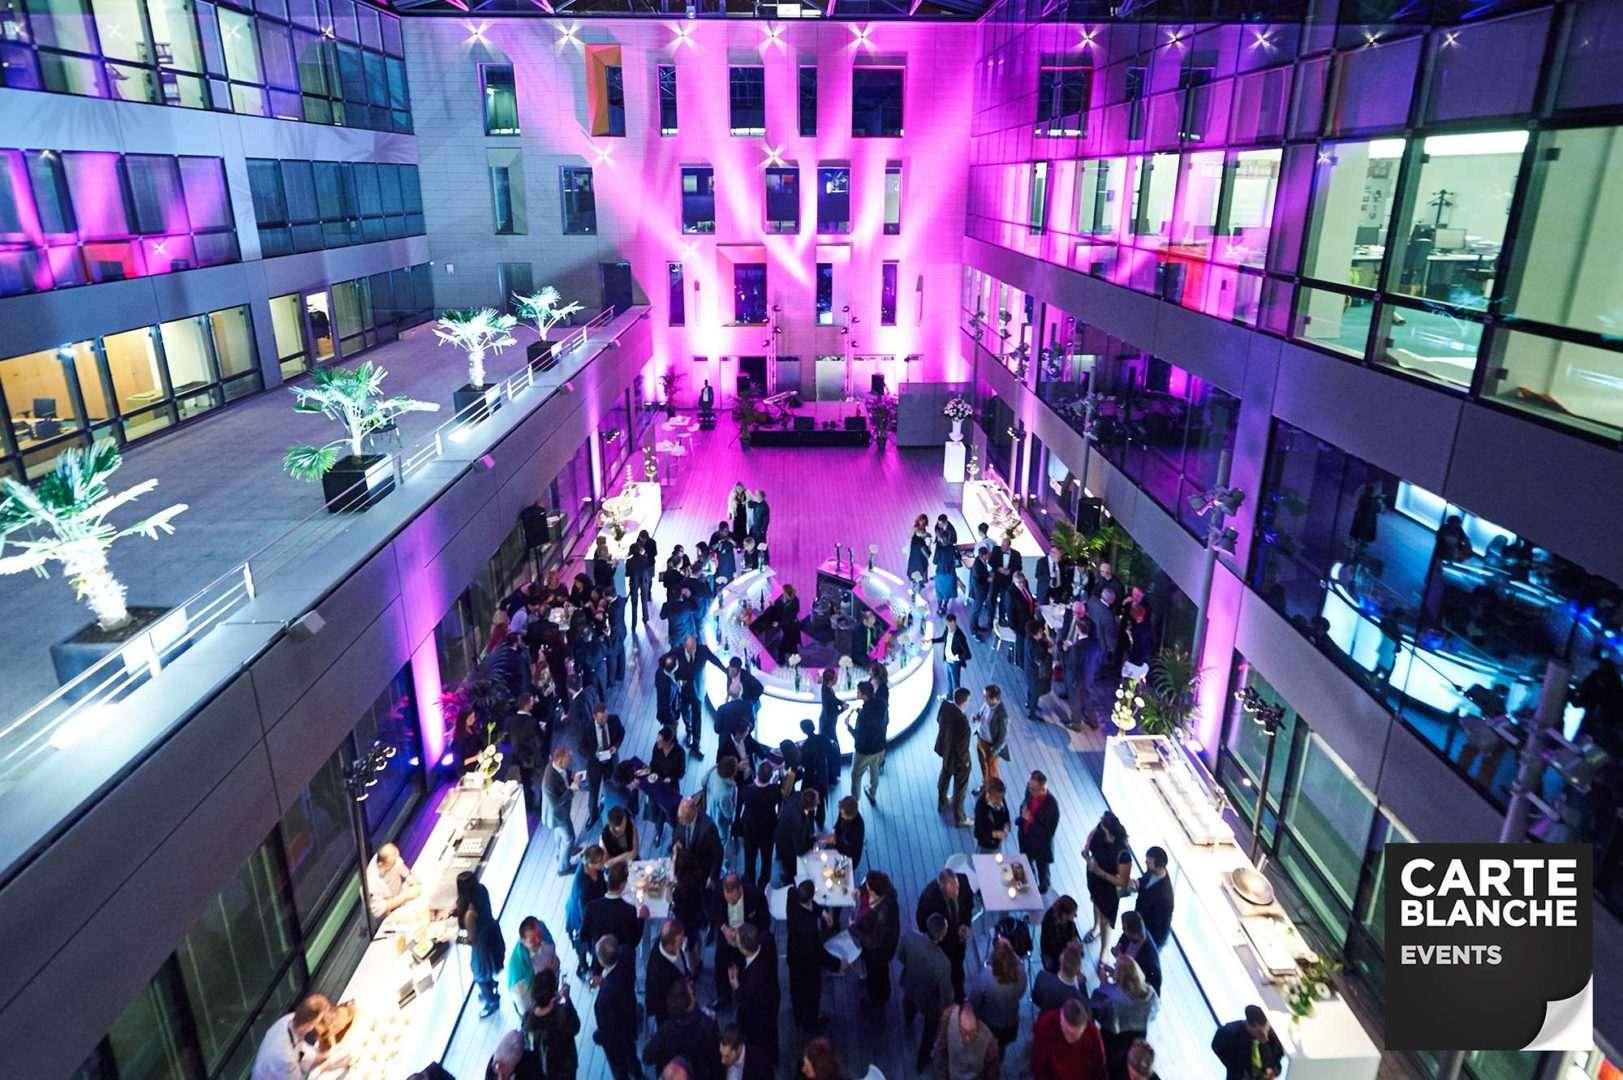 xmas-degroof-petercam-2015-040-luxembourg-event